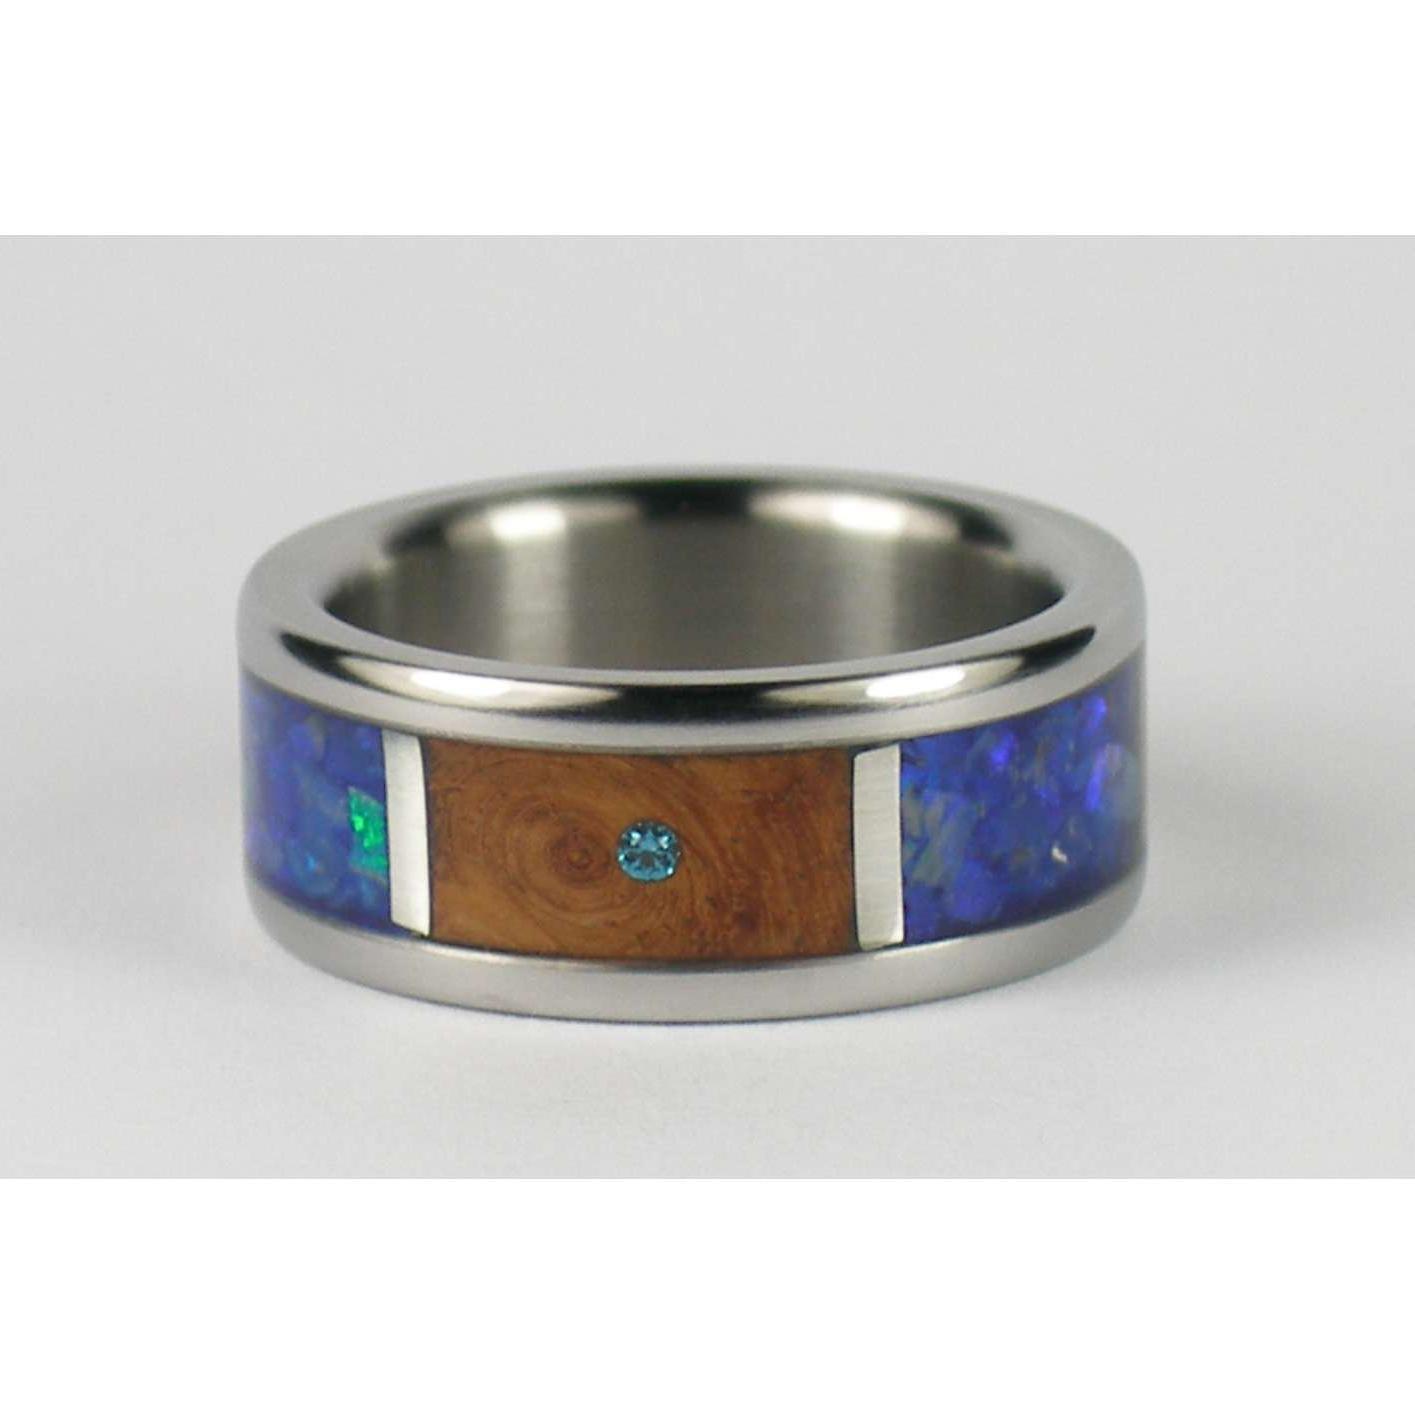 Hawaii Titanium Rings Orbits